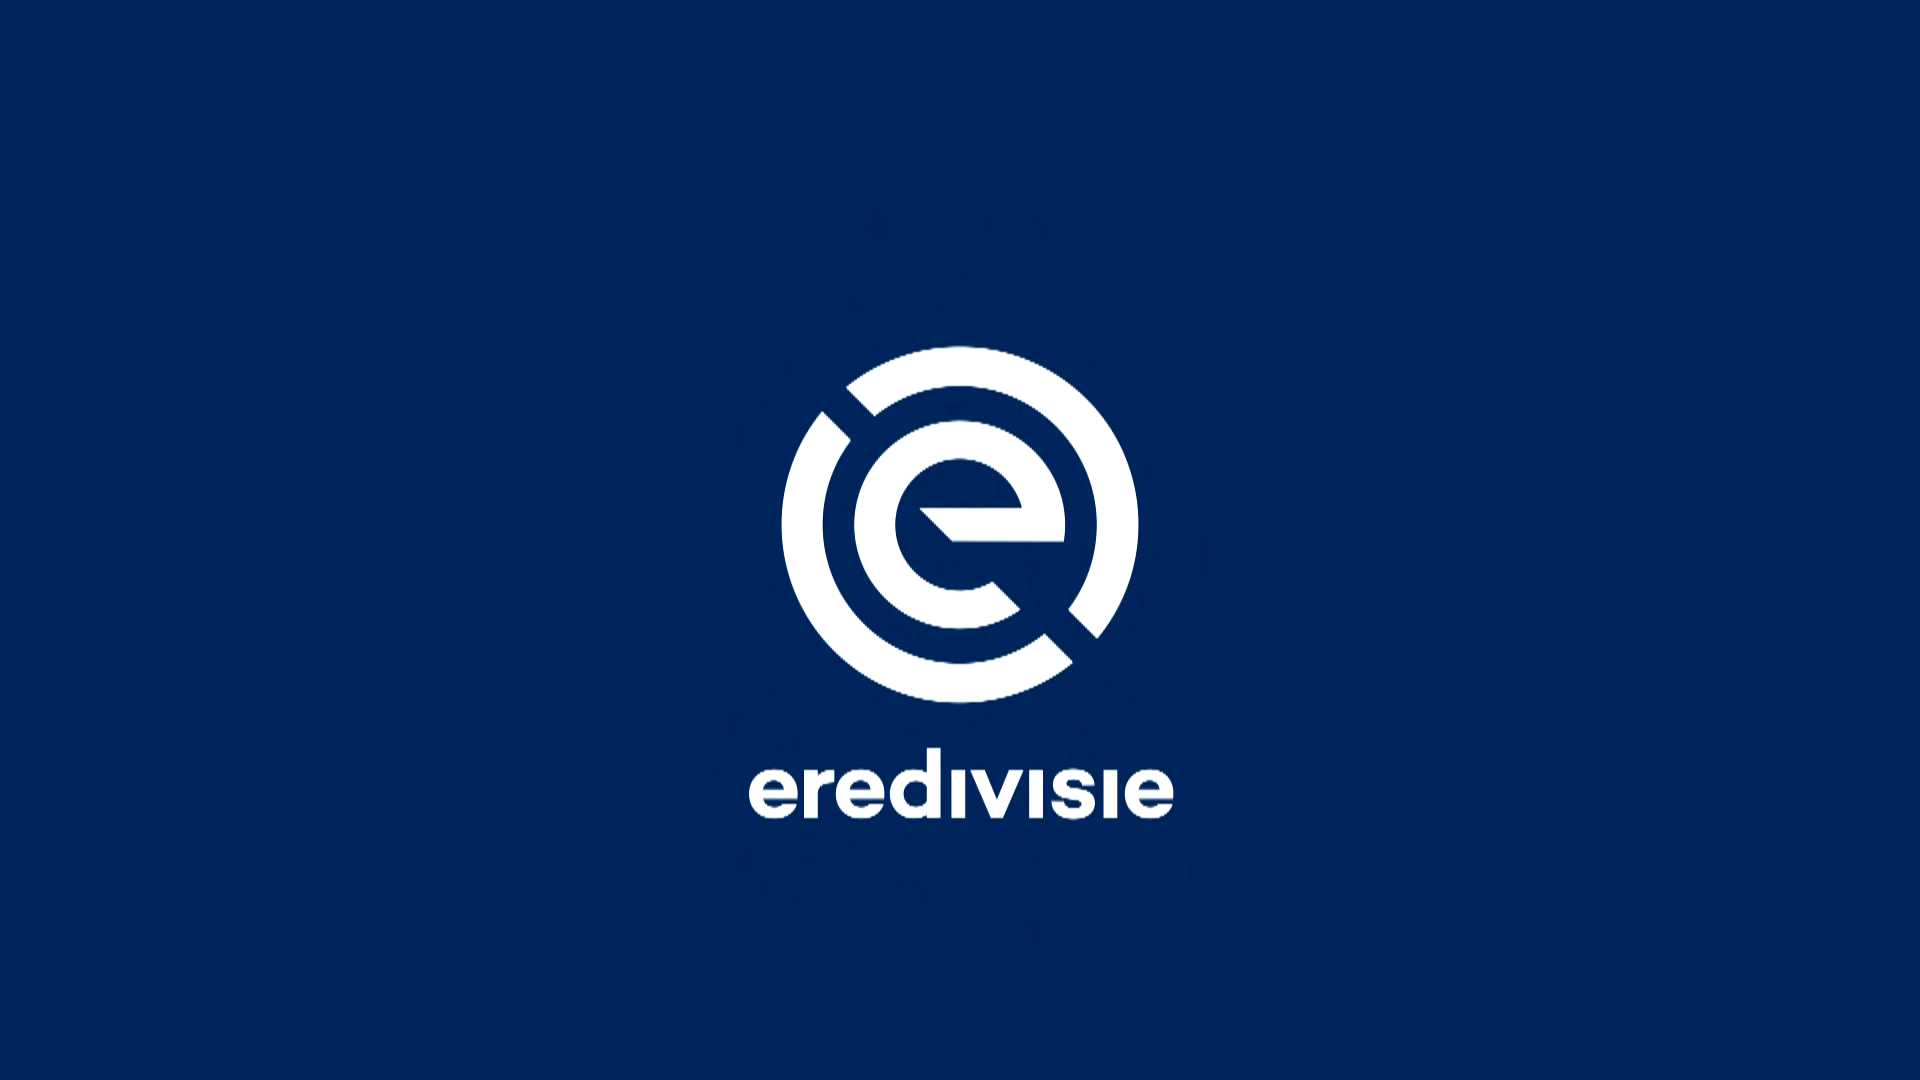 Чемпионат Нидерландов 2020/21. Обзор матчей 8 тура